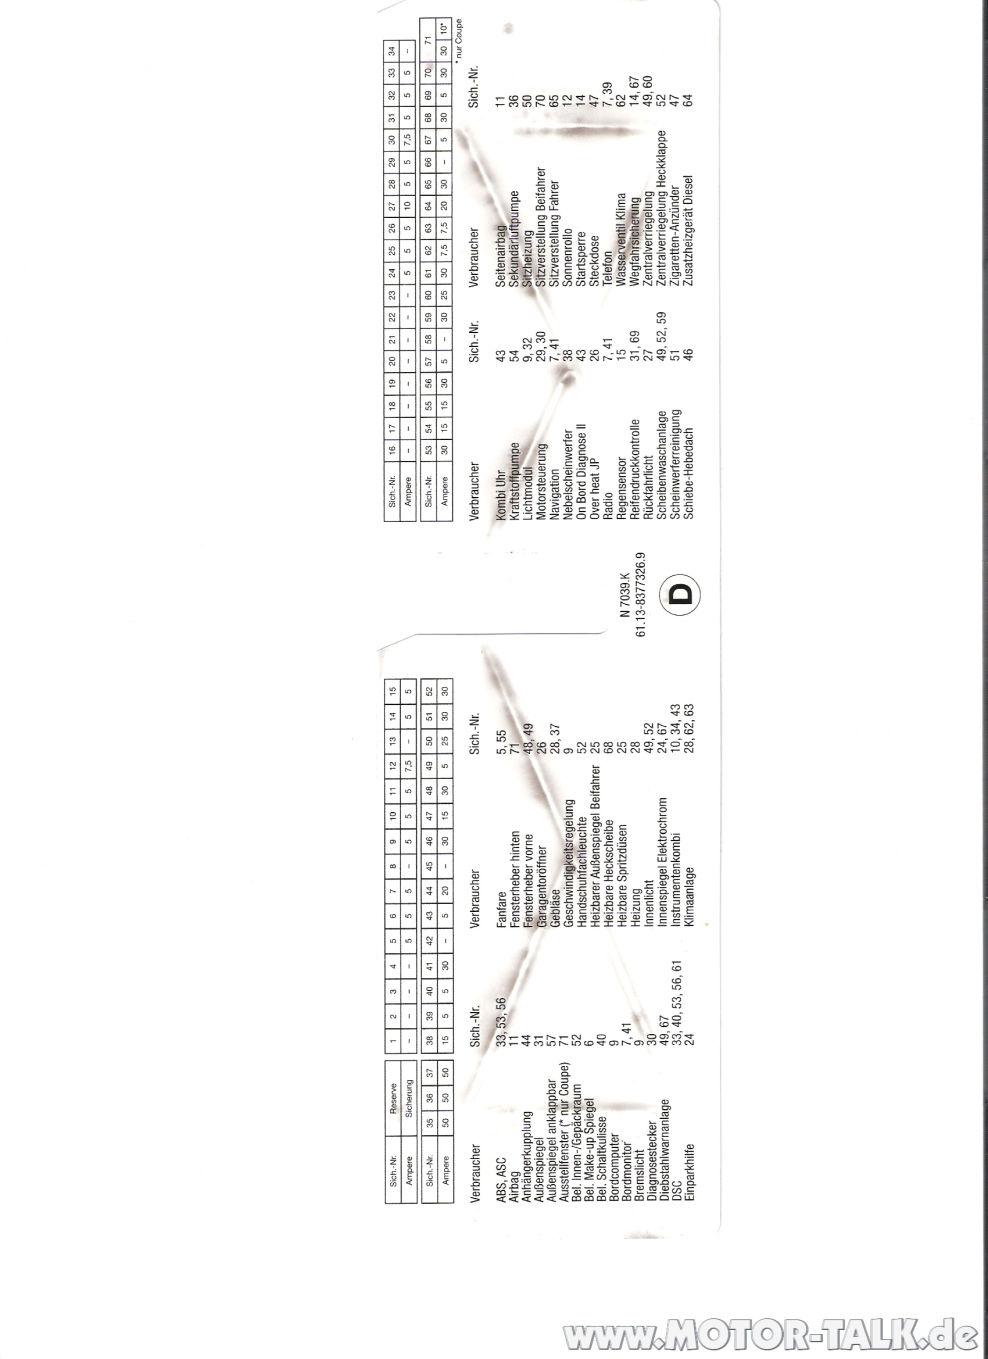 Sicherungsbelegung : 330d bj 2001 stecksicherungsplan